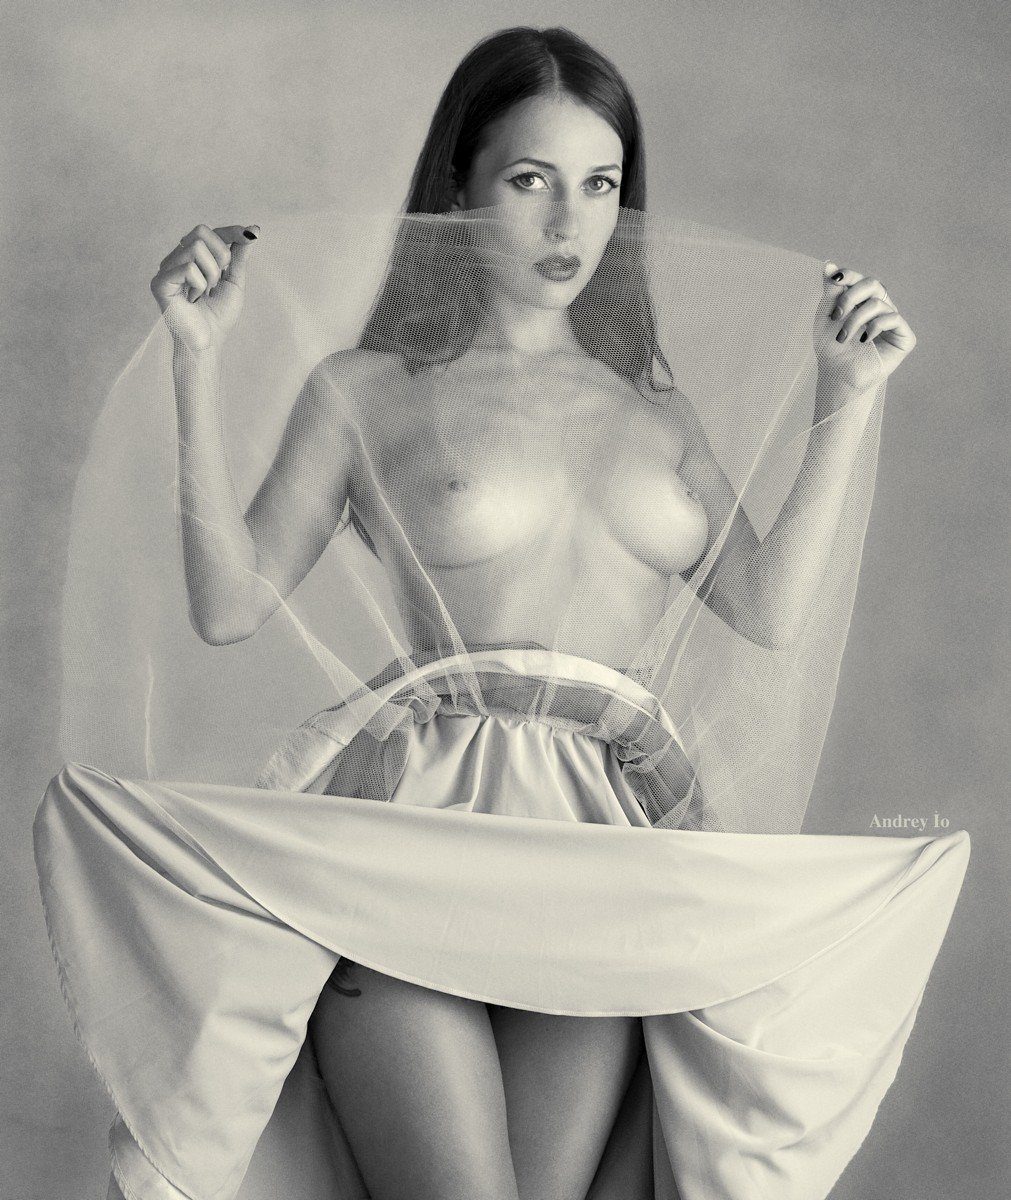 Art nude, Beauty, Black & white, Black&white, Nude, Андрей Ио